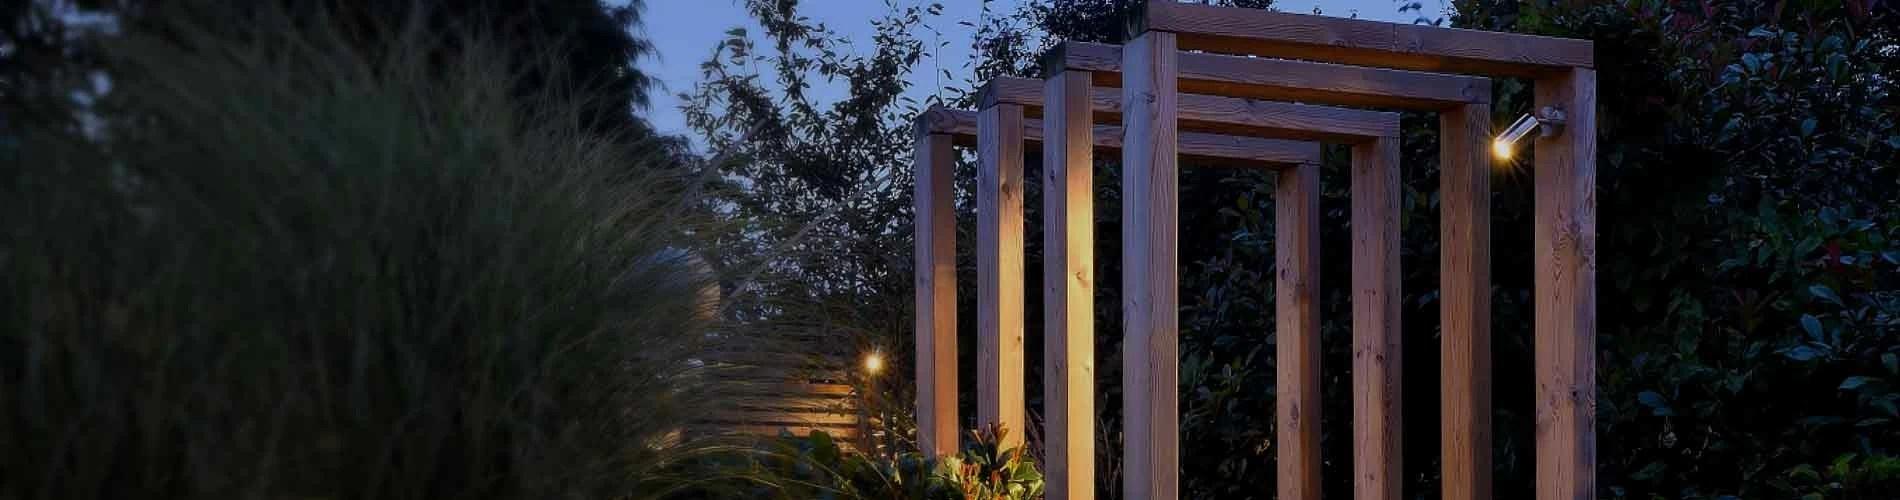 outdoor garden wall lights steplights